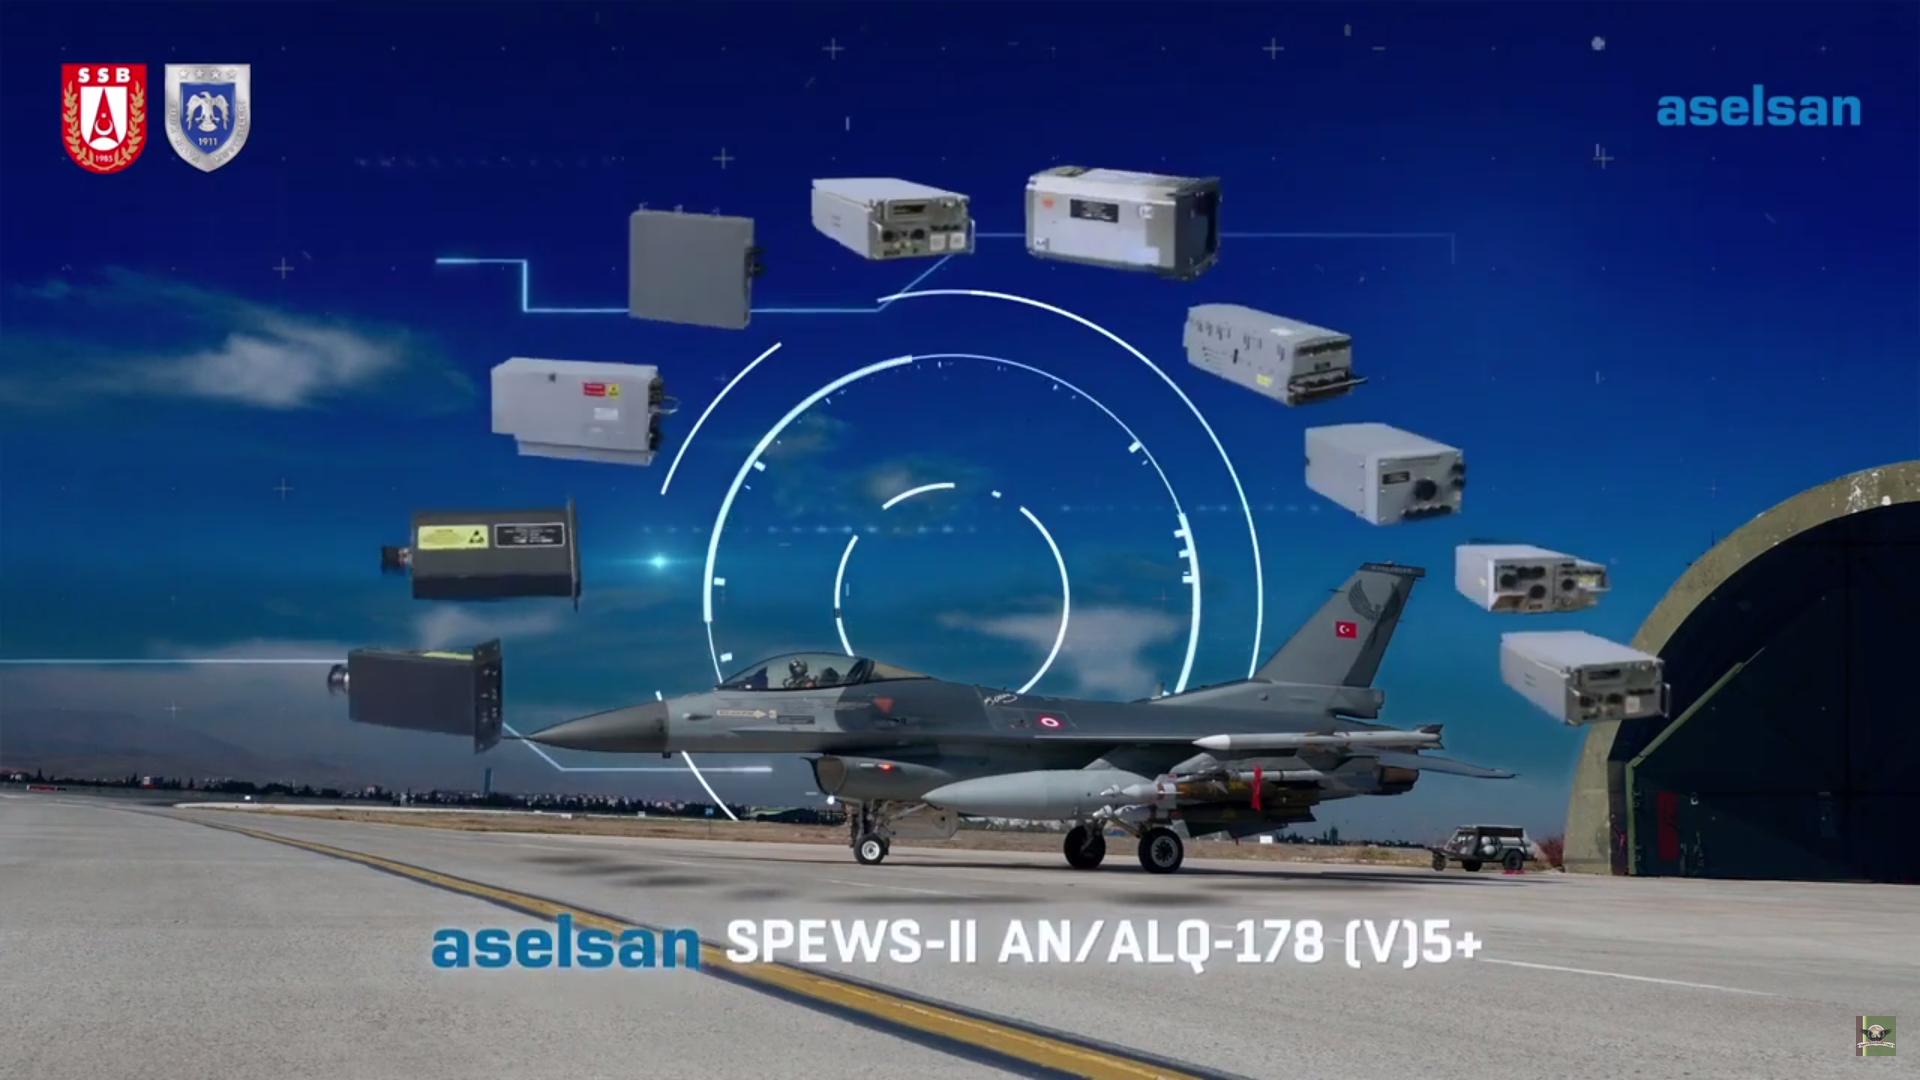 SPEWS-II AN/ALQ-178(V)5+ ve AIDEWS EH Öz Savunma Sistemleri